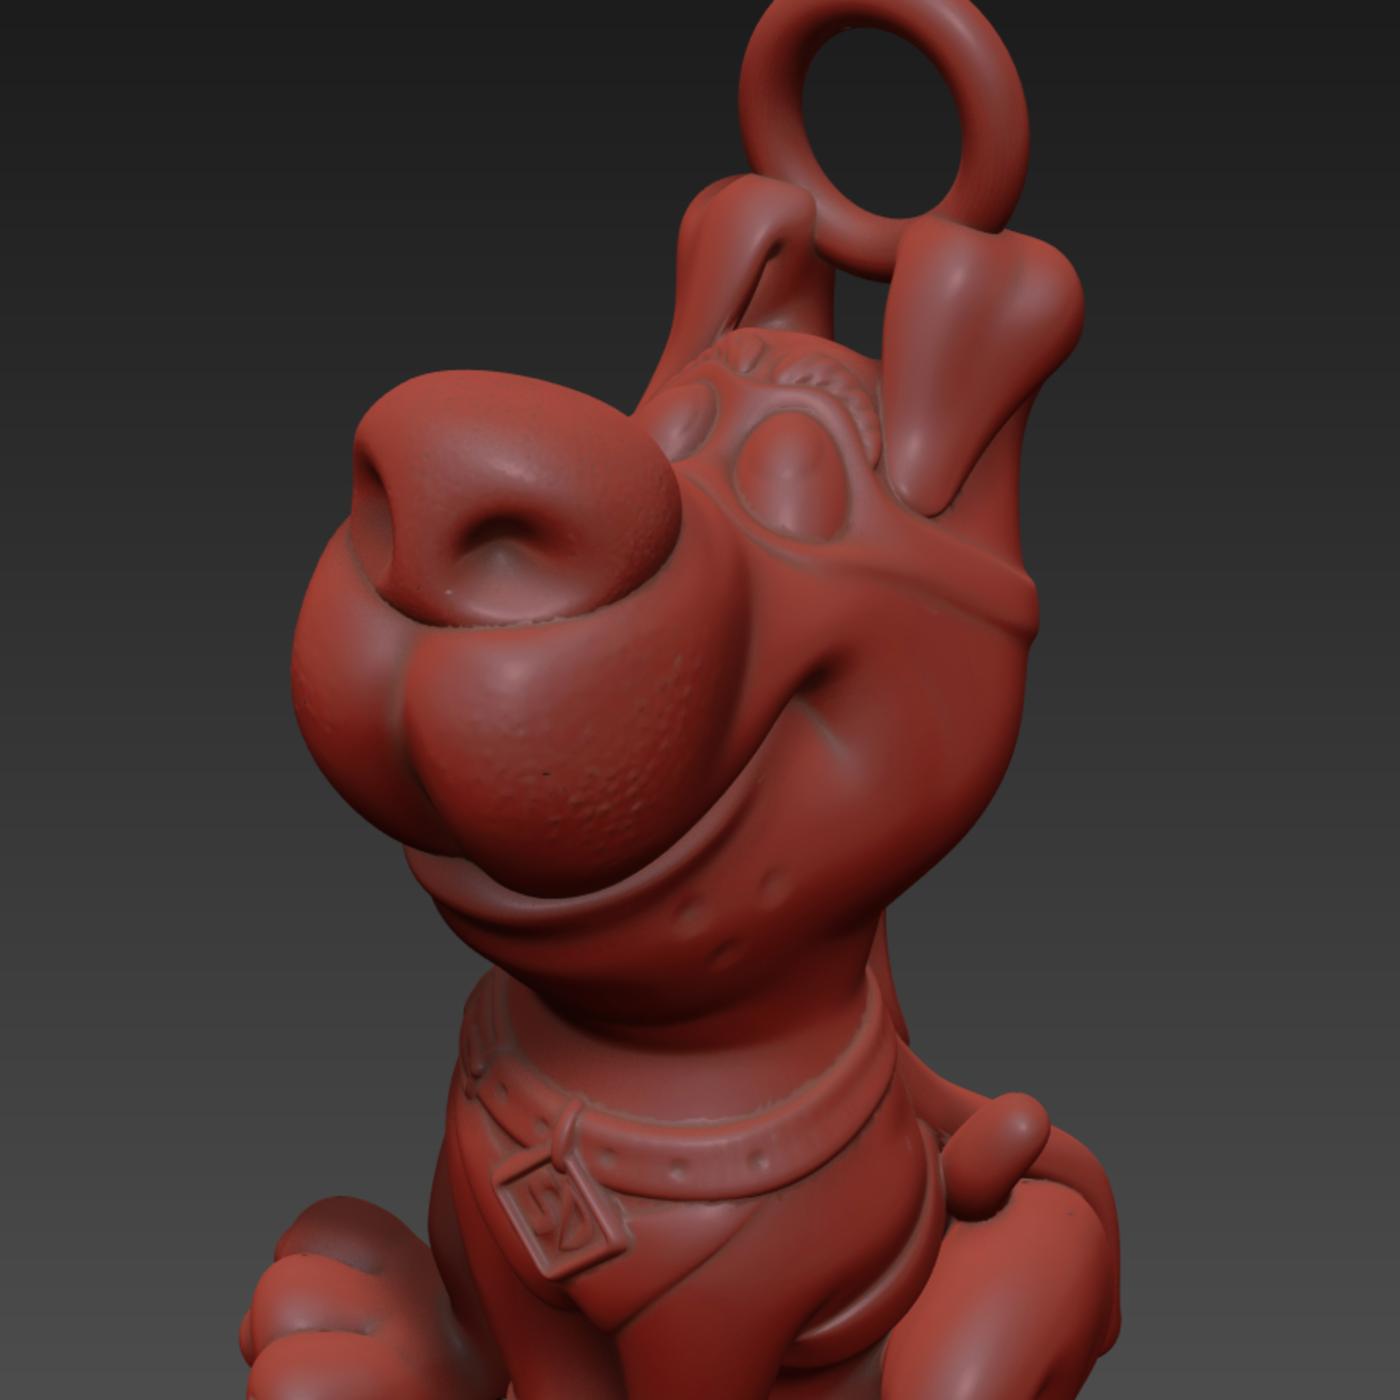 Scooby Dog Cartoon pendant jewelry gold necklace medallion 3D print model